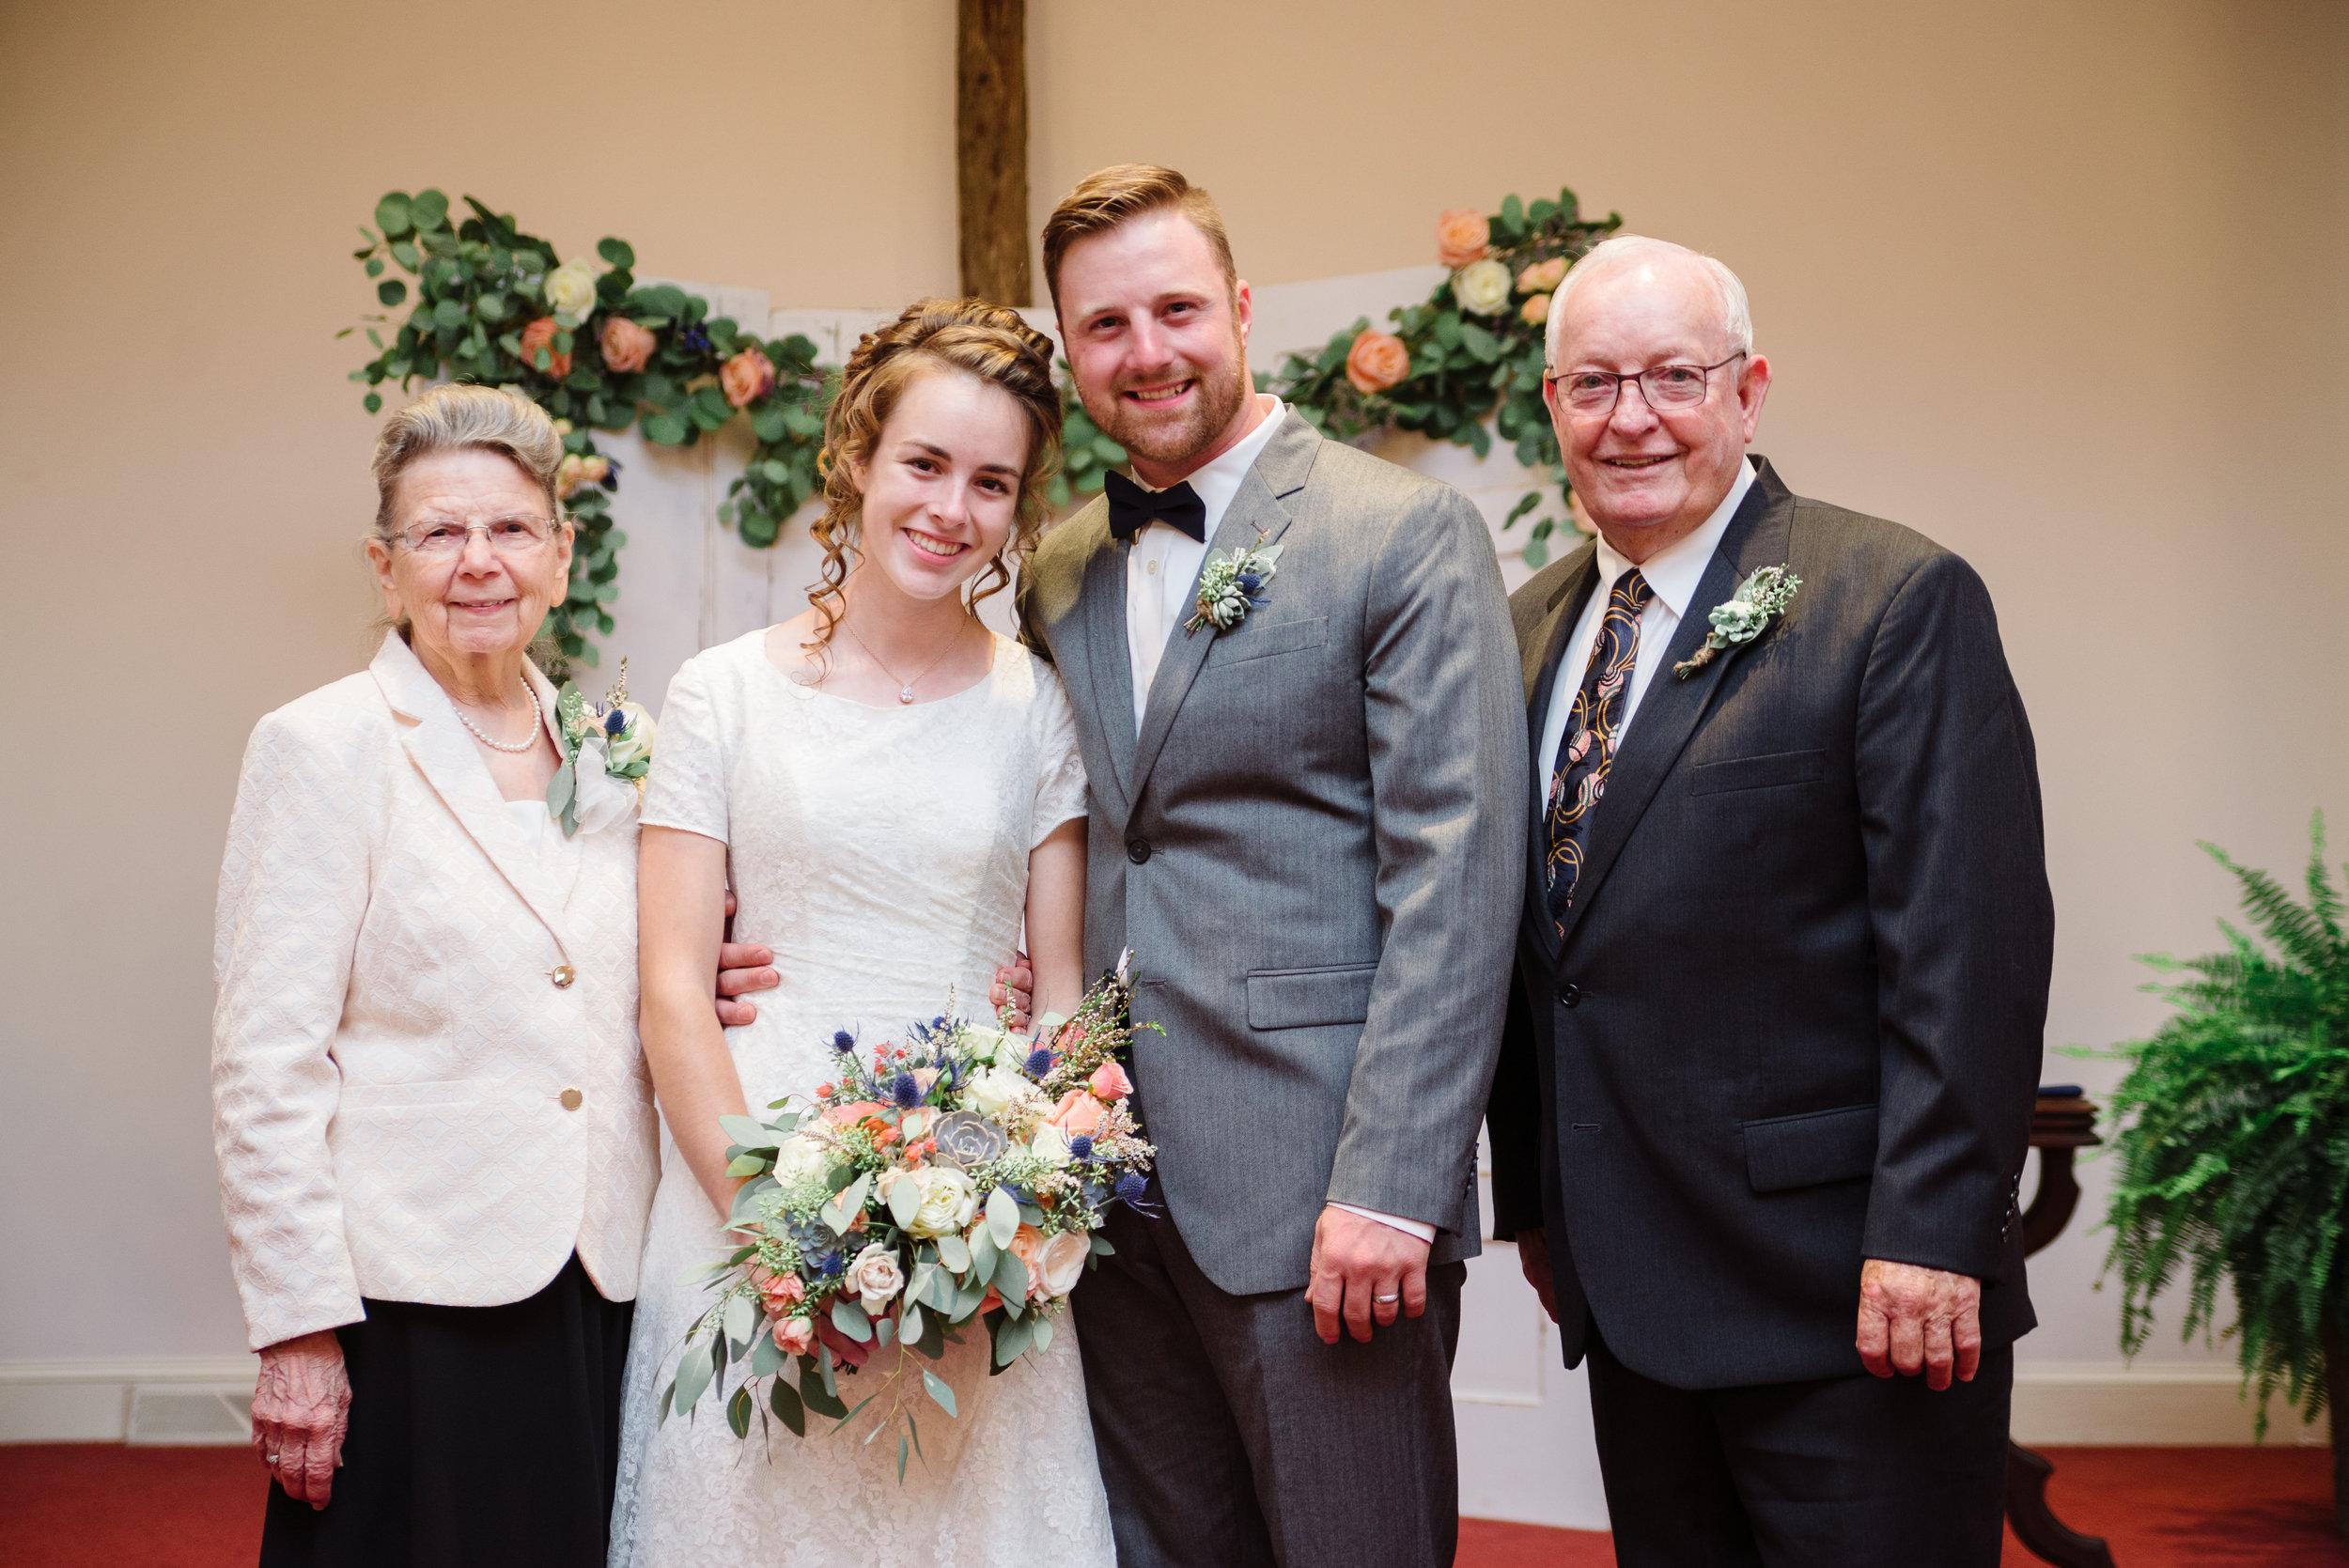 Grandpa and Grandma Phillips